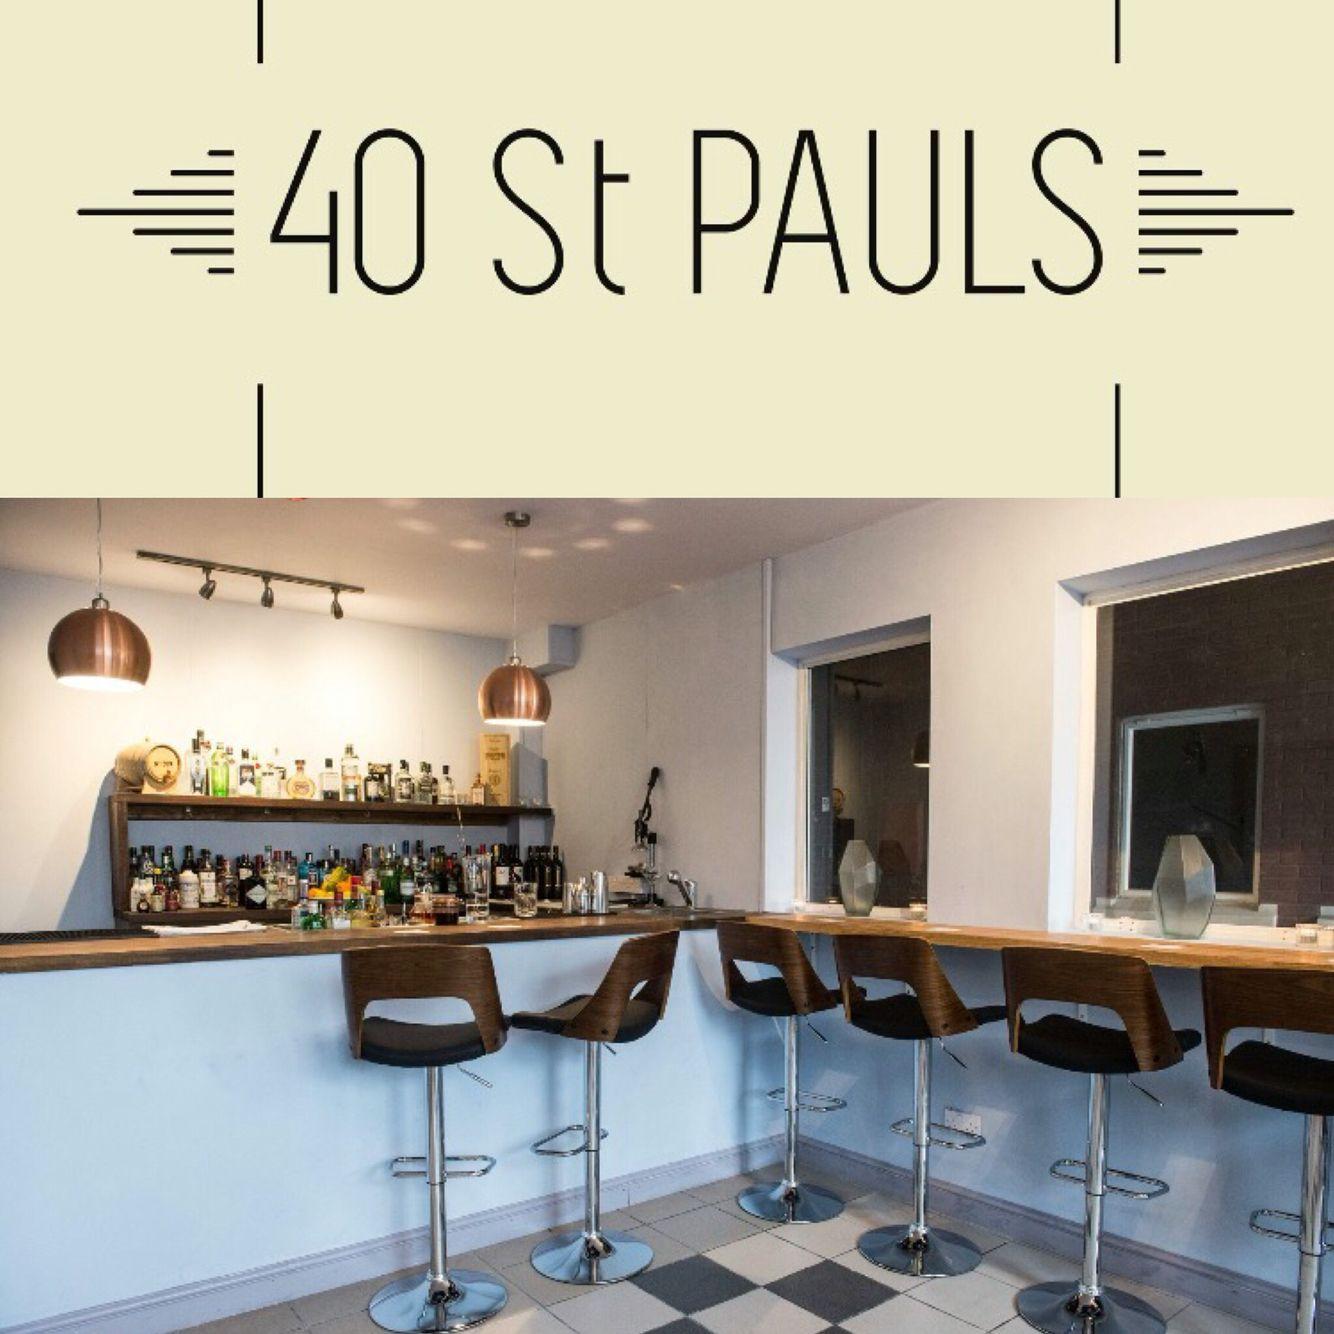 40 St Pauls Gin Bar Cox Street Birmingham Birmingham Pinterest # Muebles Halesowen